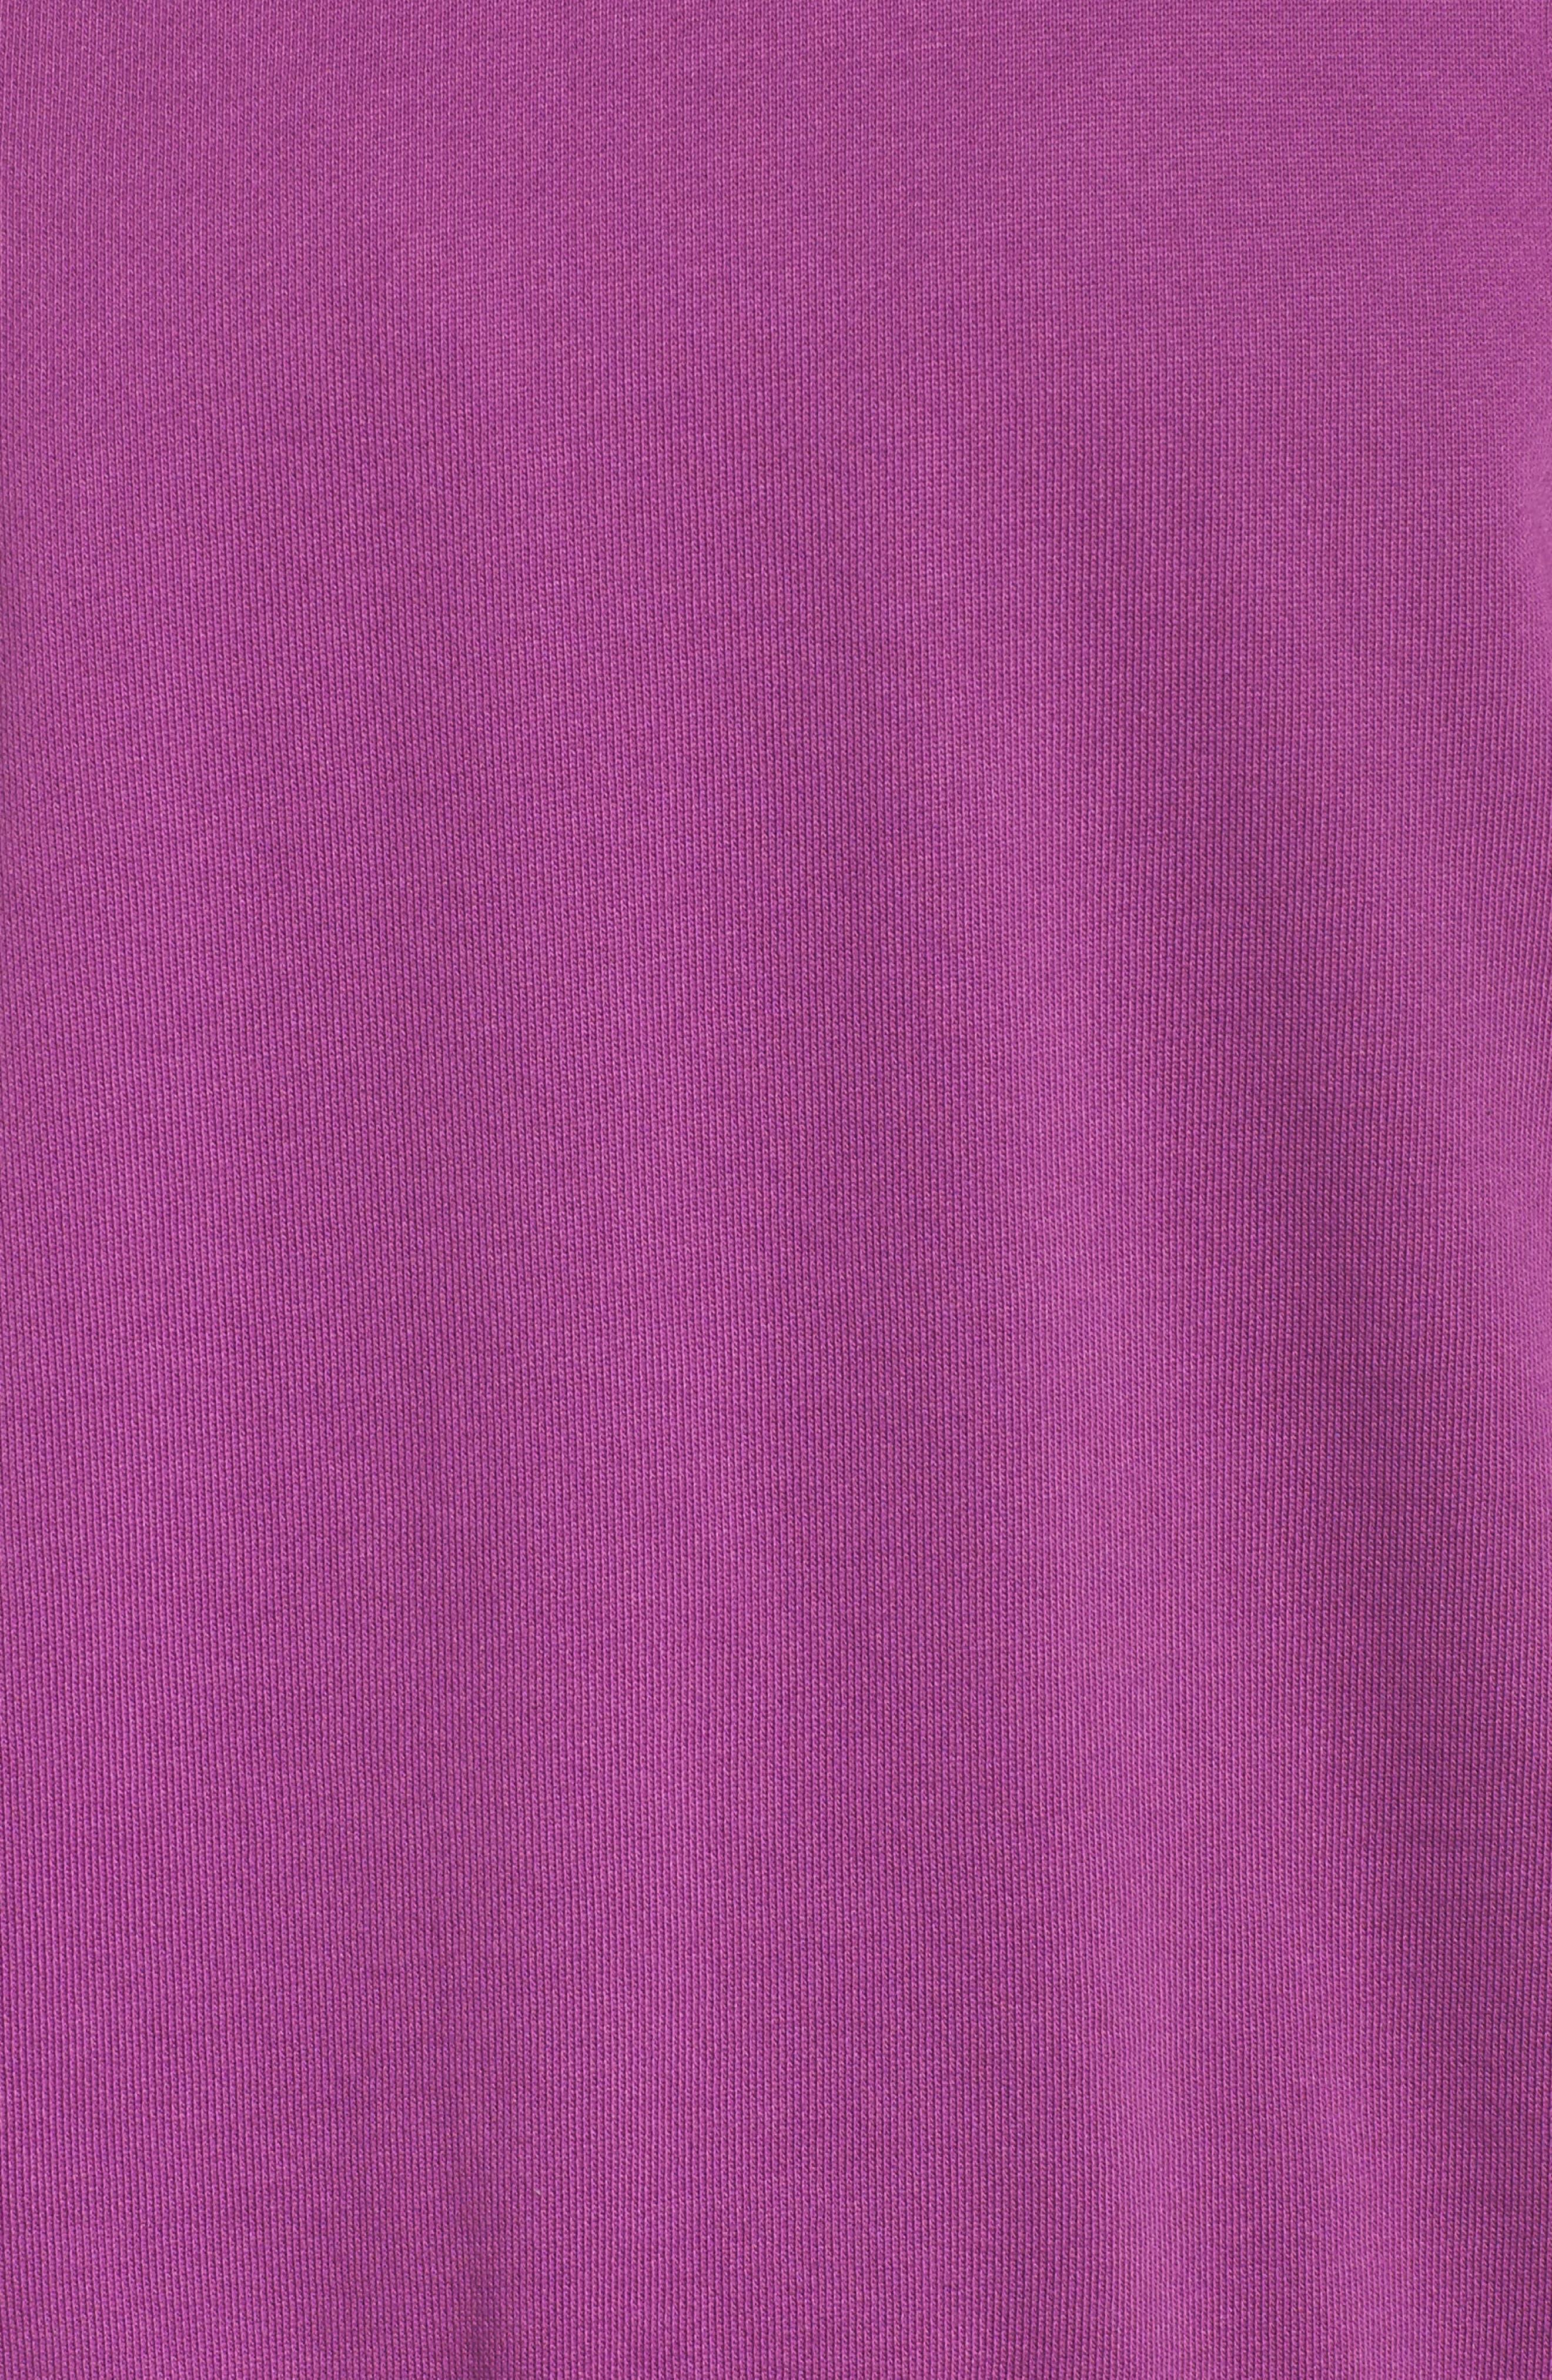 Moneyball Sweatshirt,                             Alternate thumbnail 6, color,                             500